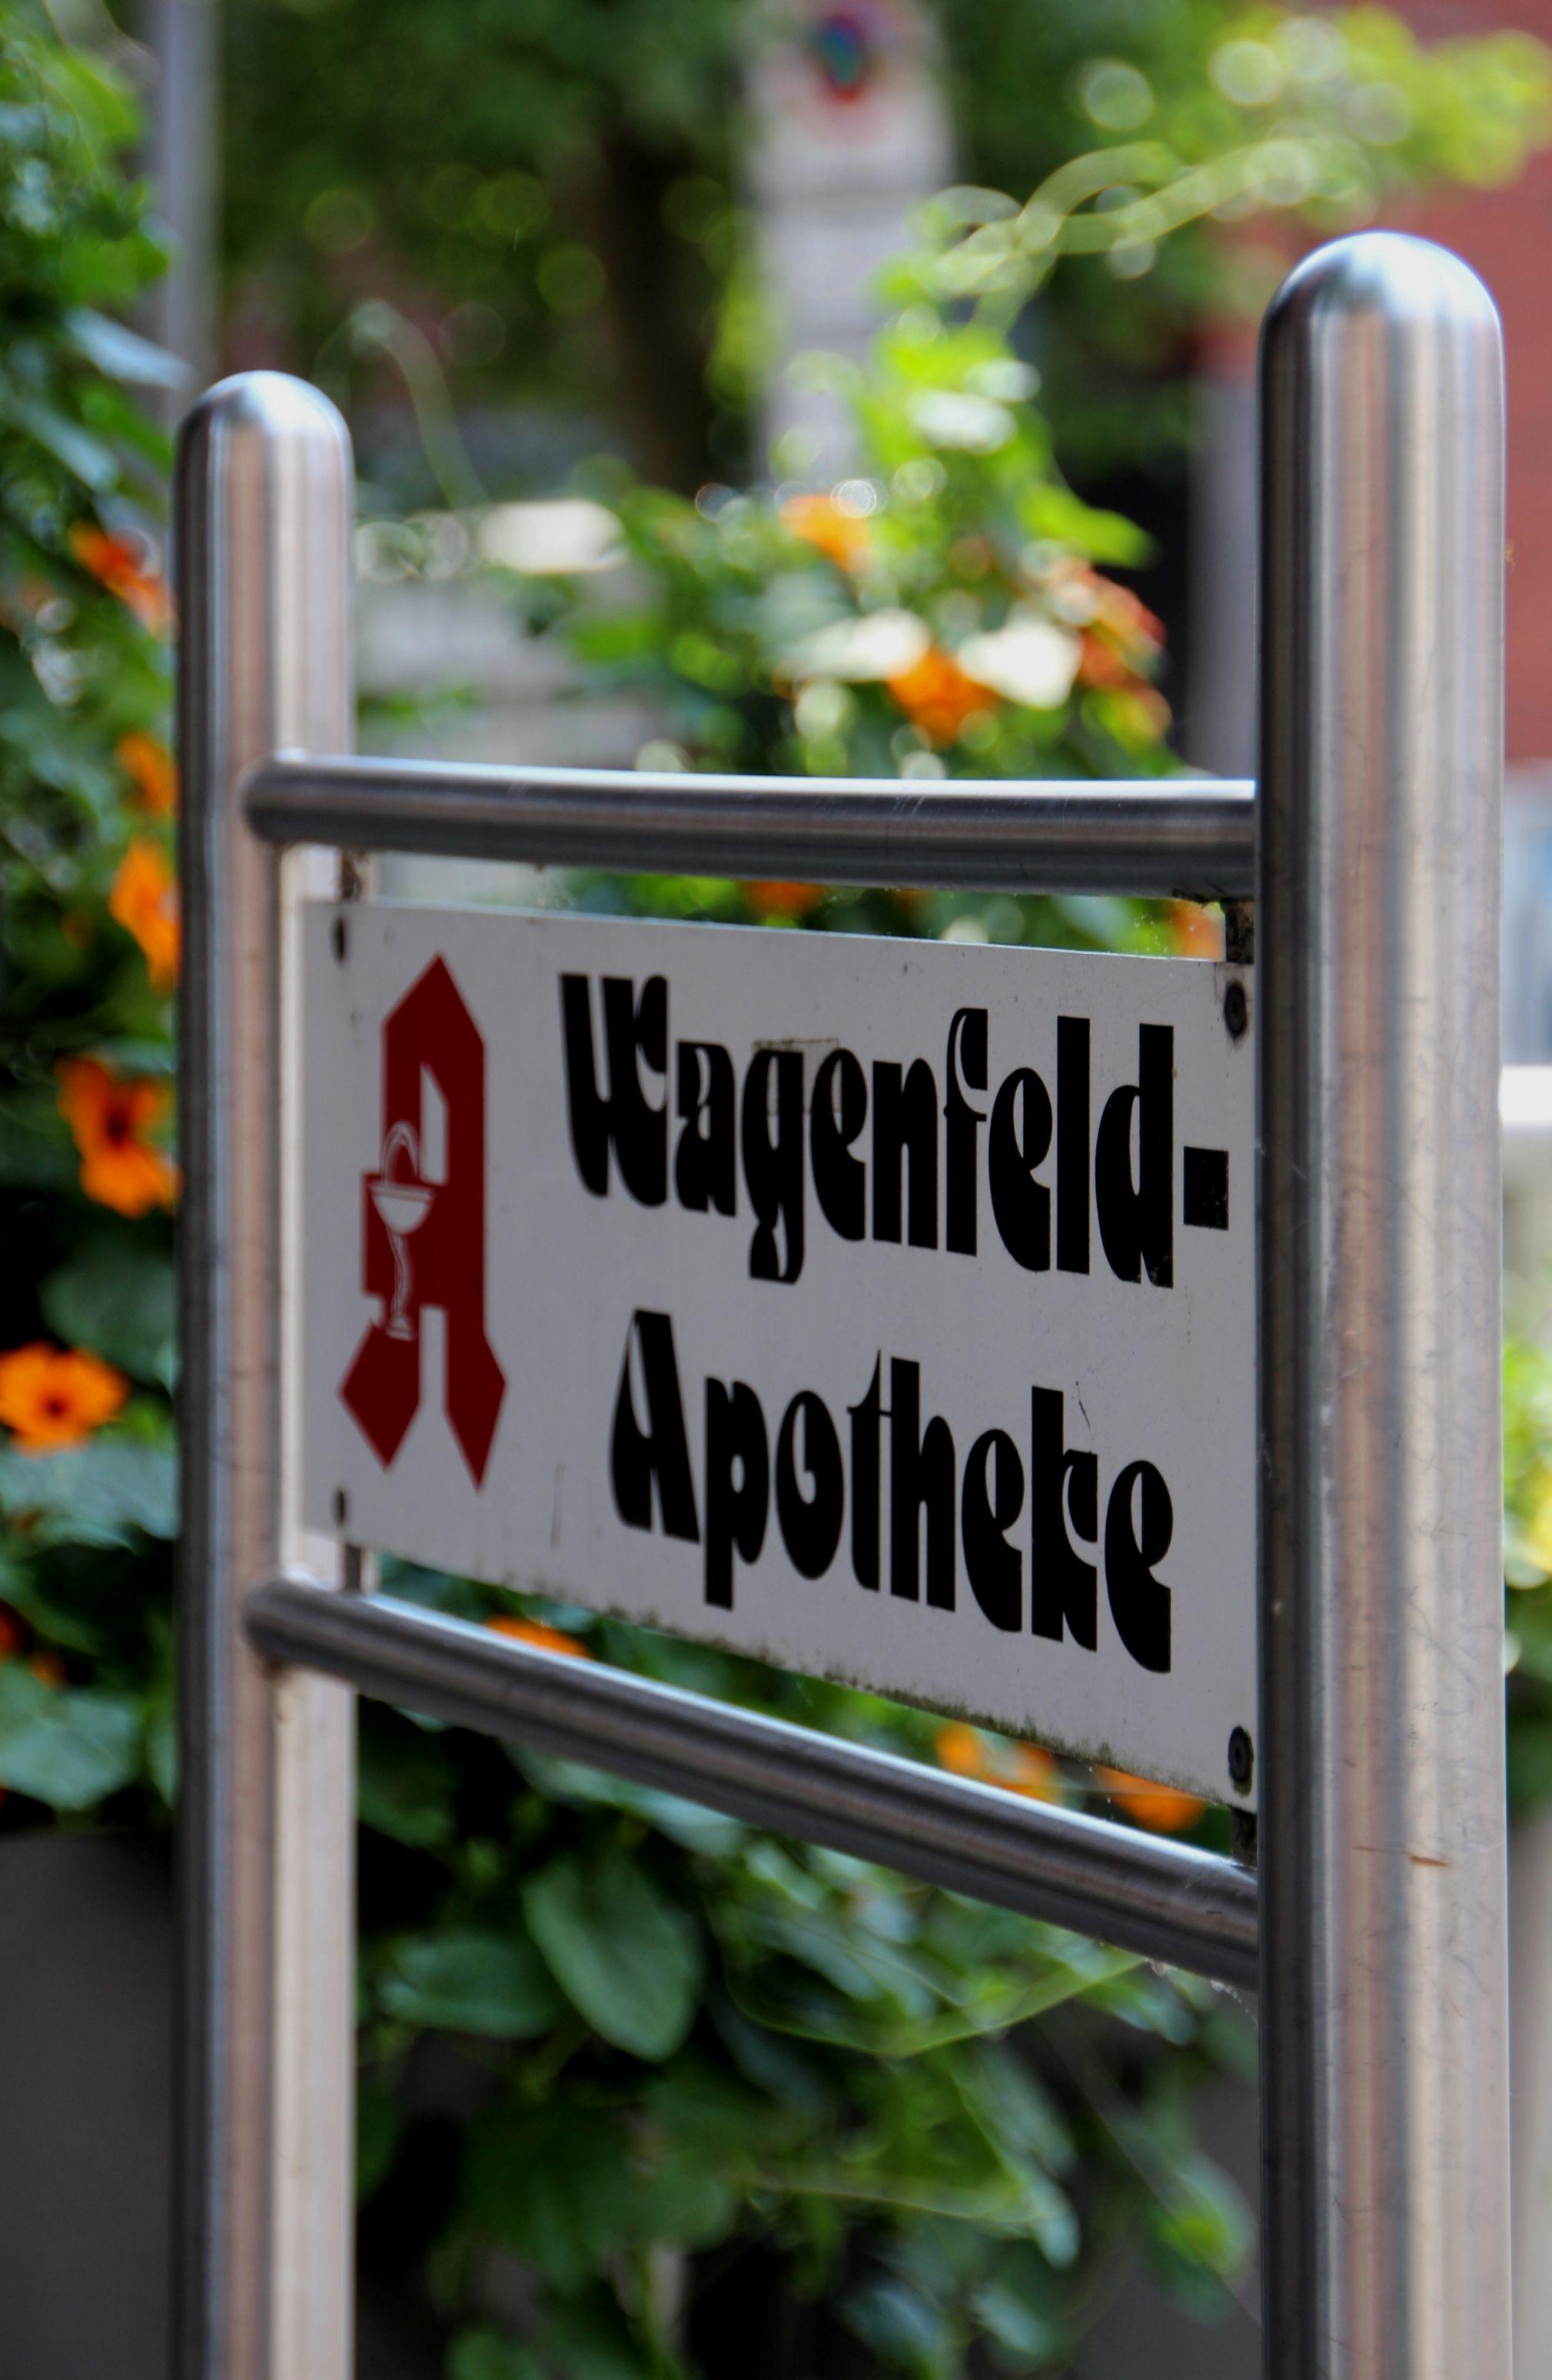 Wagenfeld-Apotheke